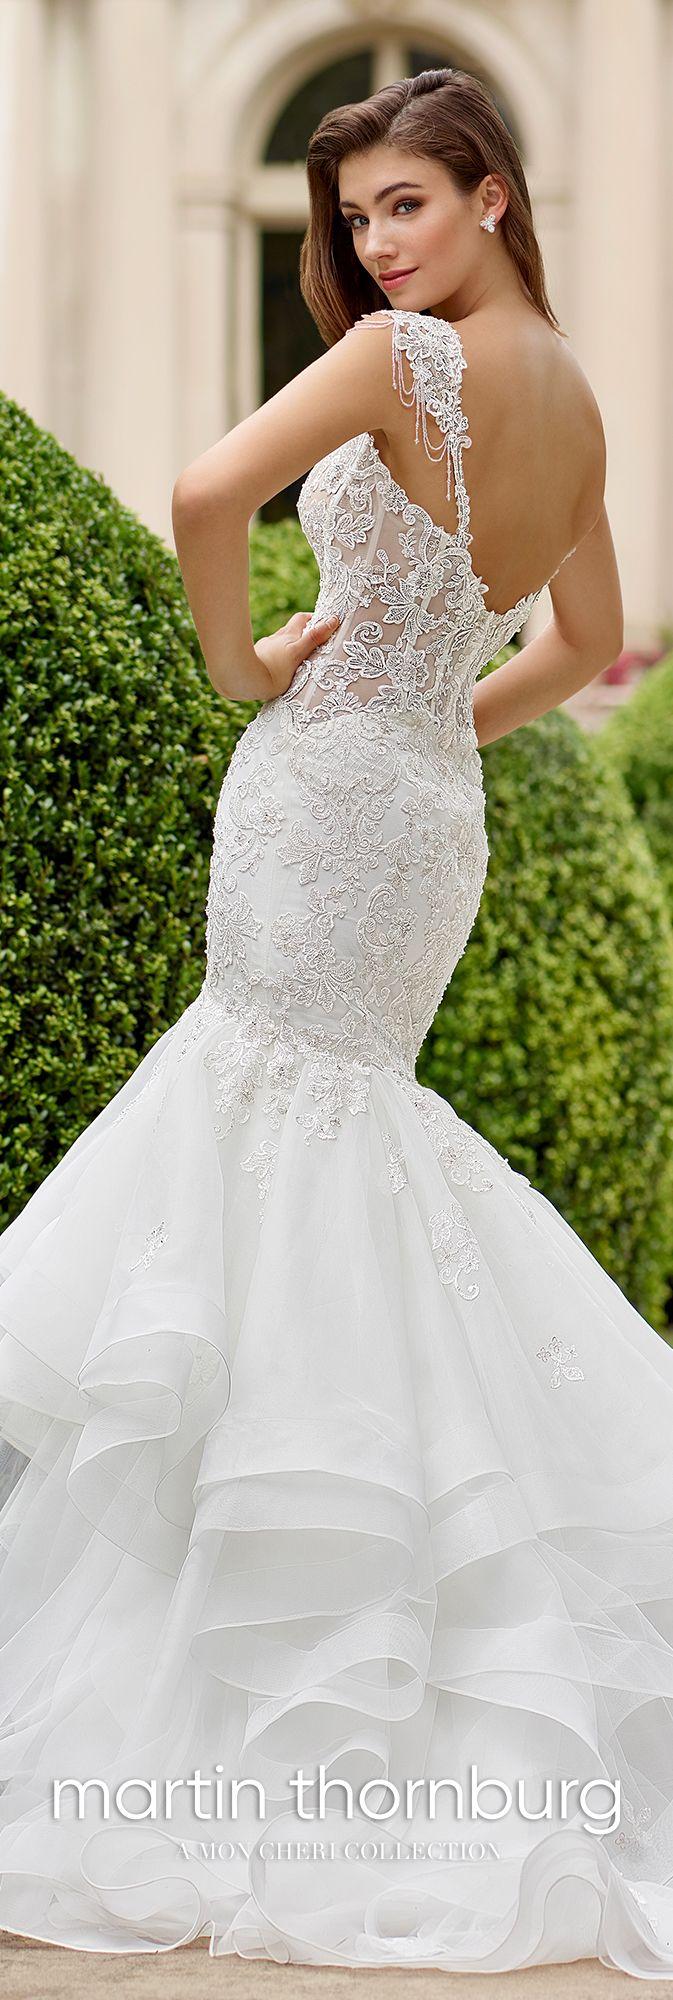 2128 best Mon Cheri Bridals images on Pinterest | Wedding frocks ...